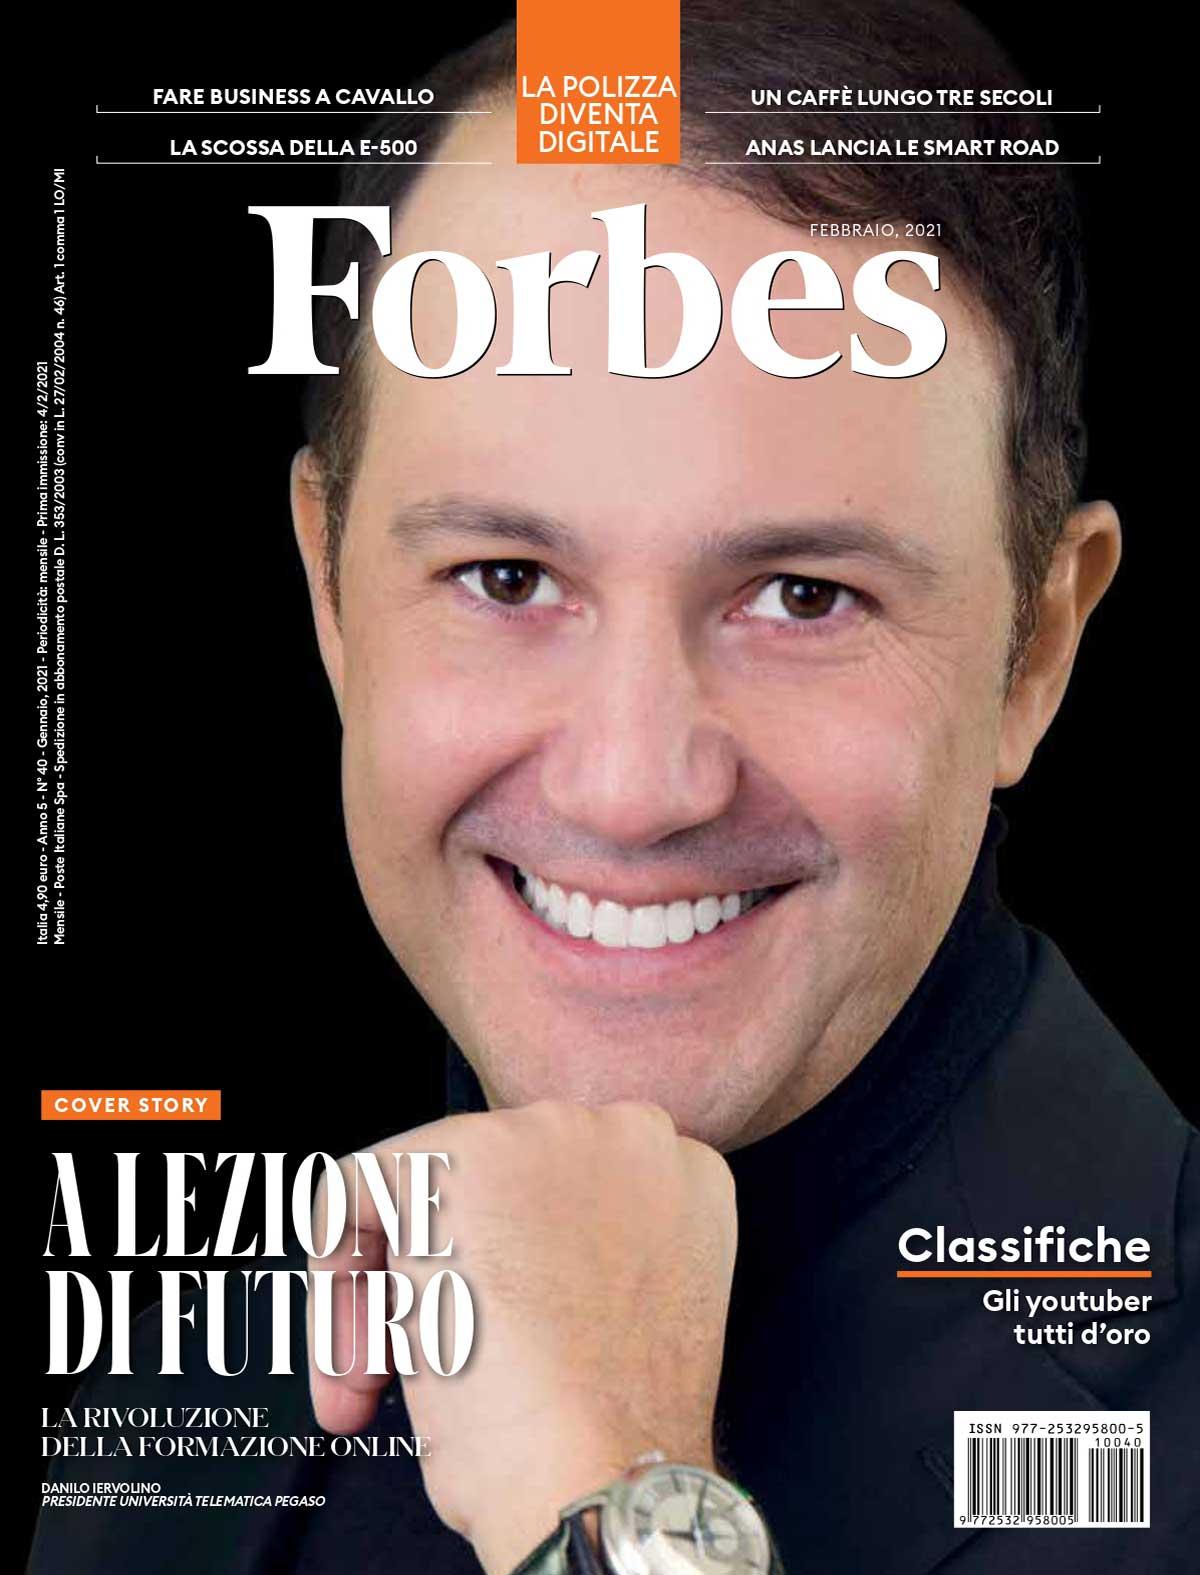 Copertina Forbes febbraio 2021